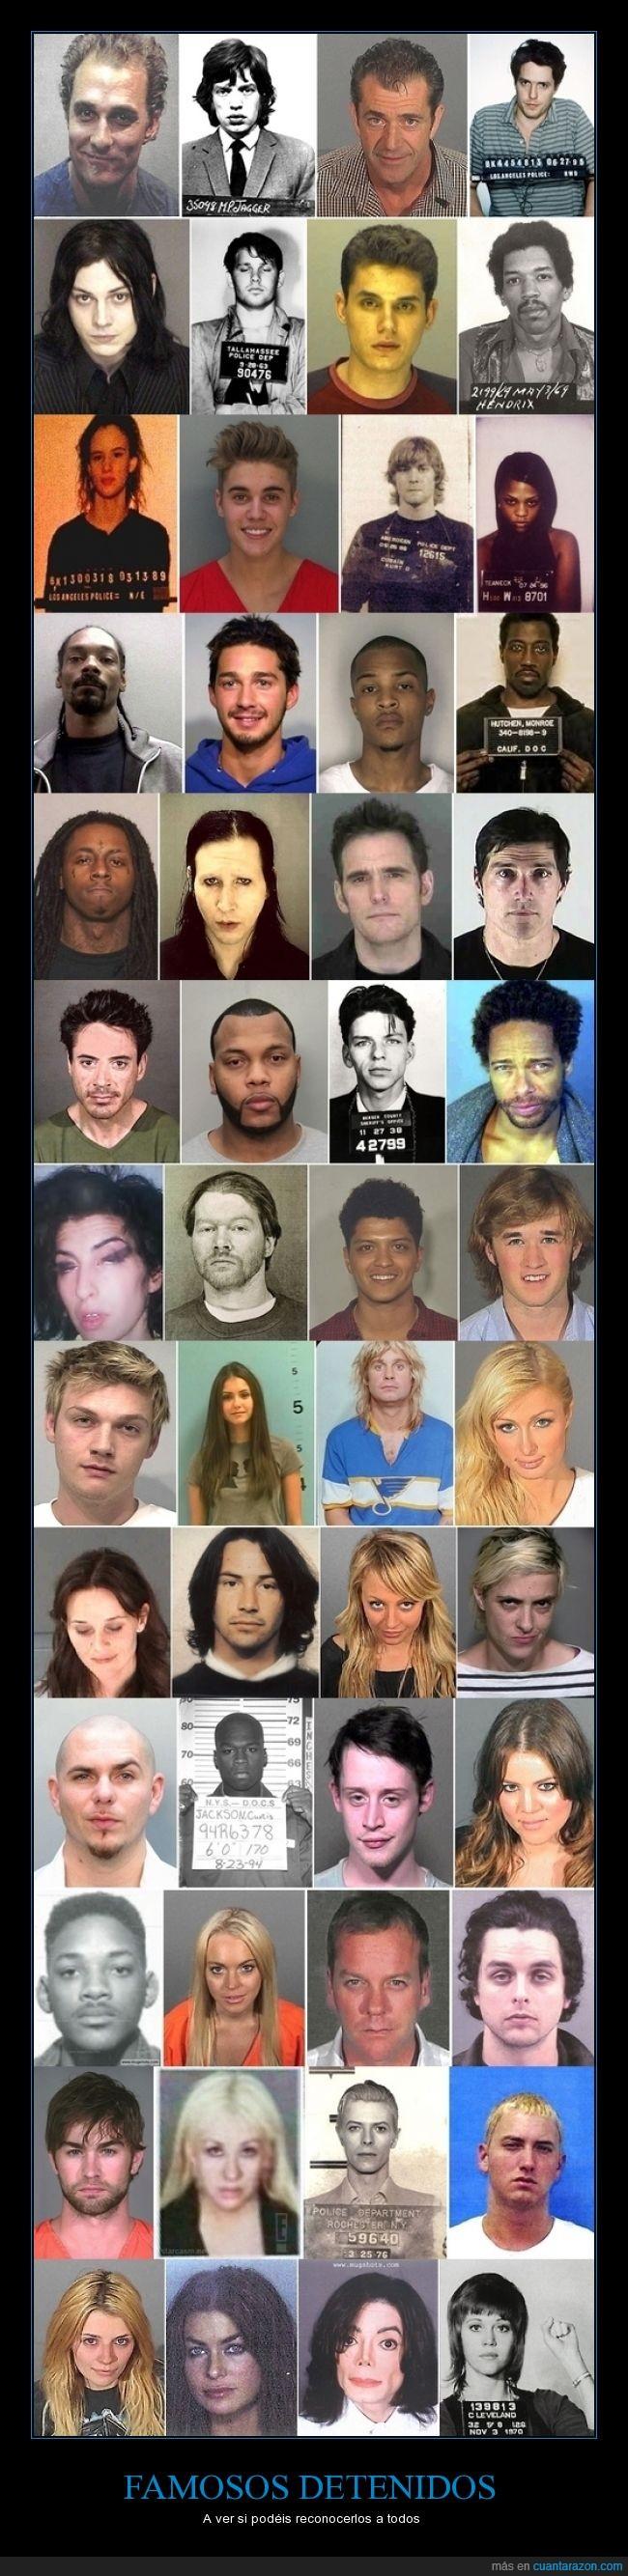 carcel,detener,detenidos,famosos,ficha policial,foto,mugshot,policia